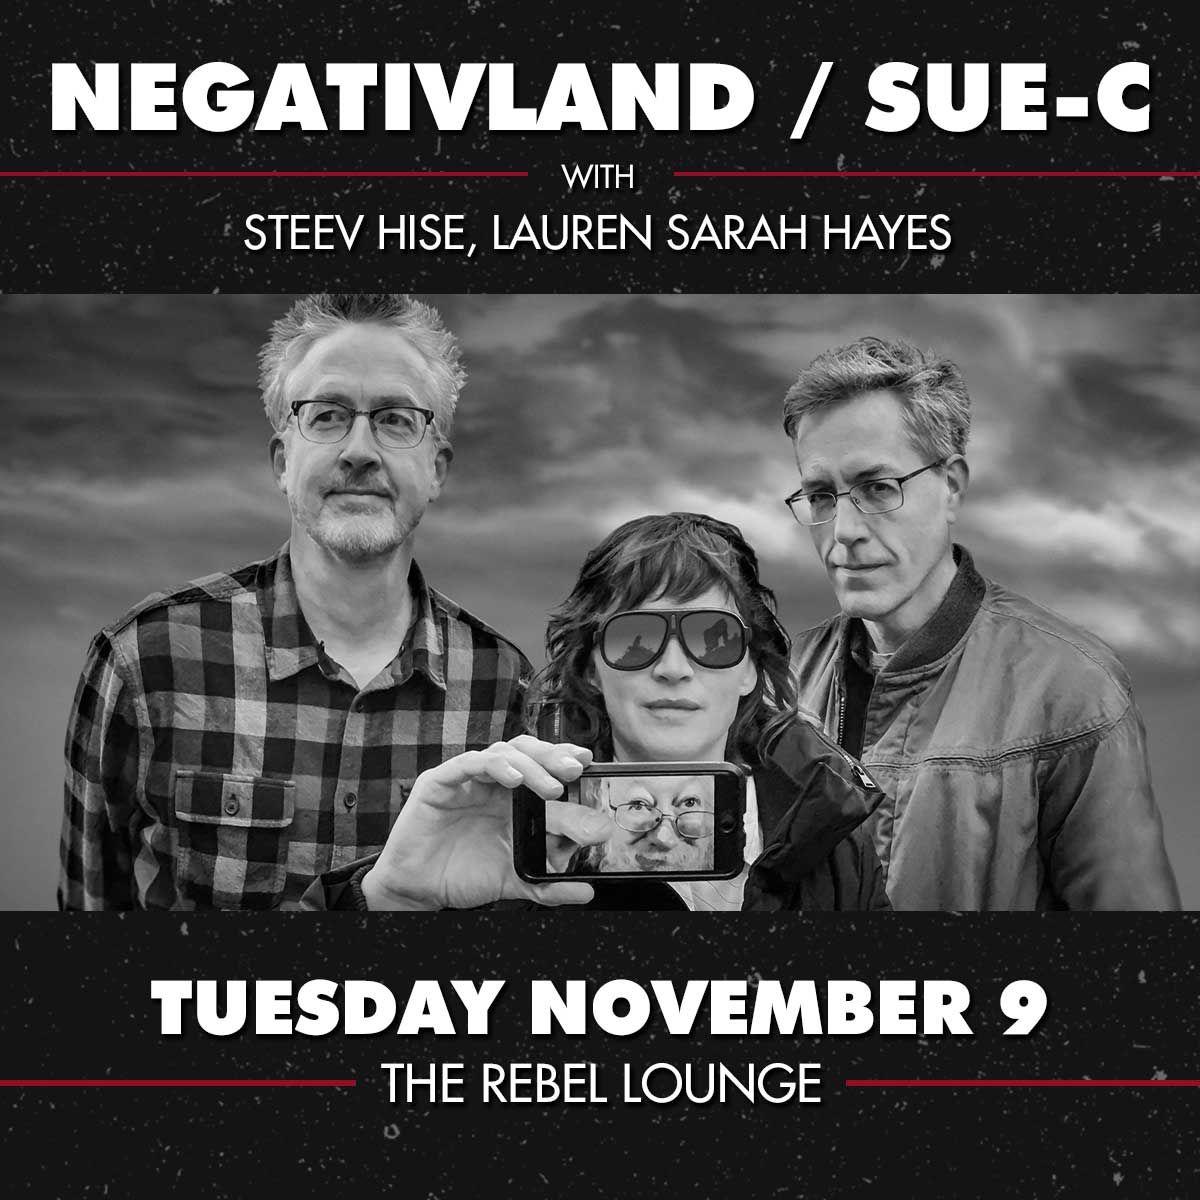 NEGATIVLAND and SUE-C: